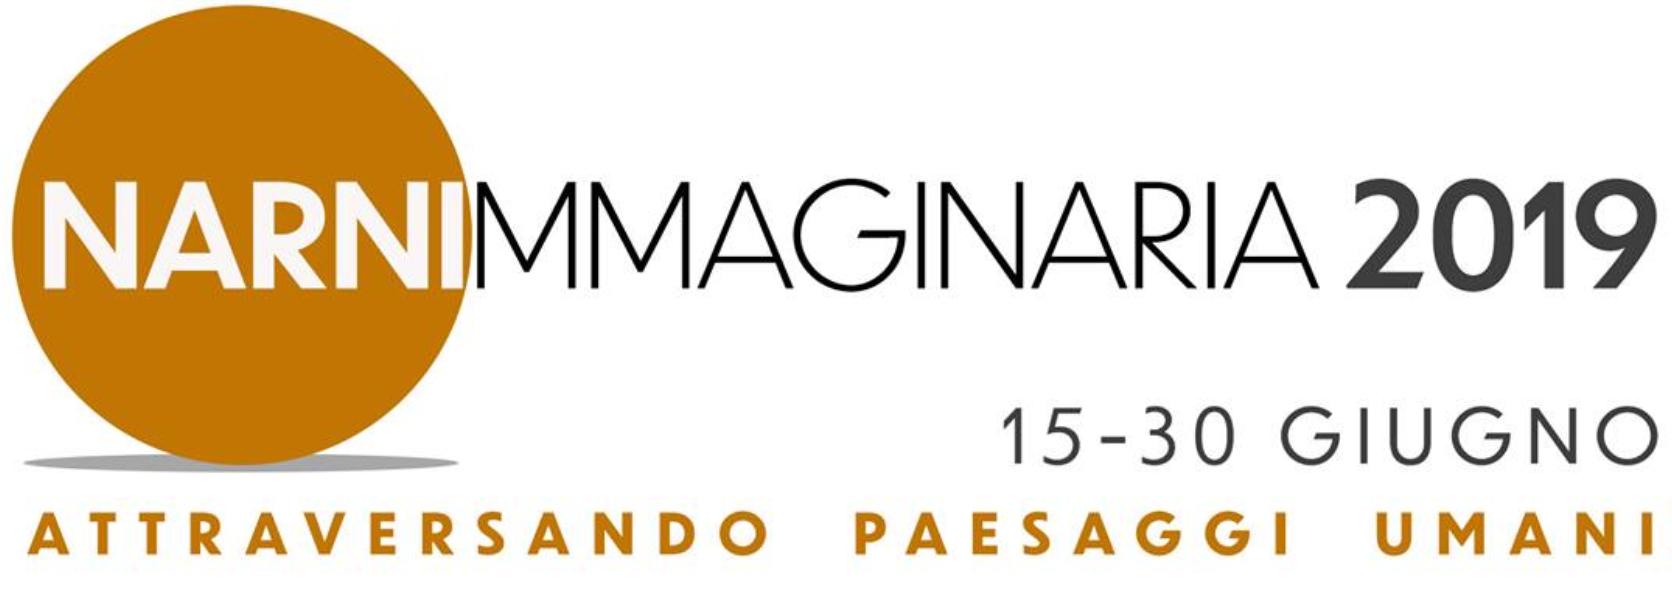 Narnimmaginaria 2019 - Portfolio Lecture Awards